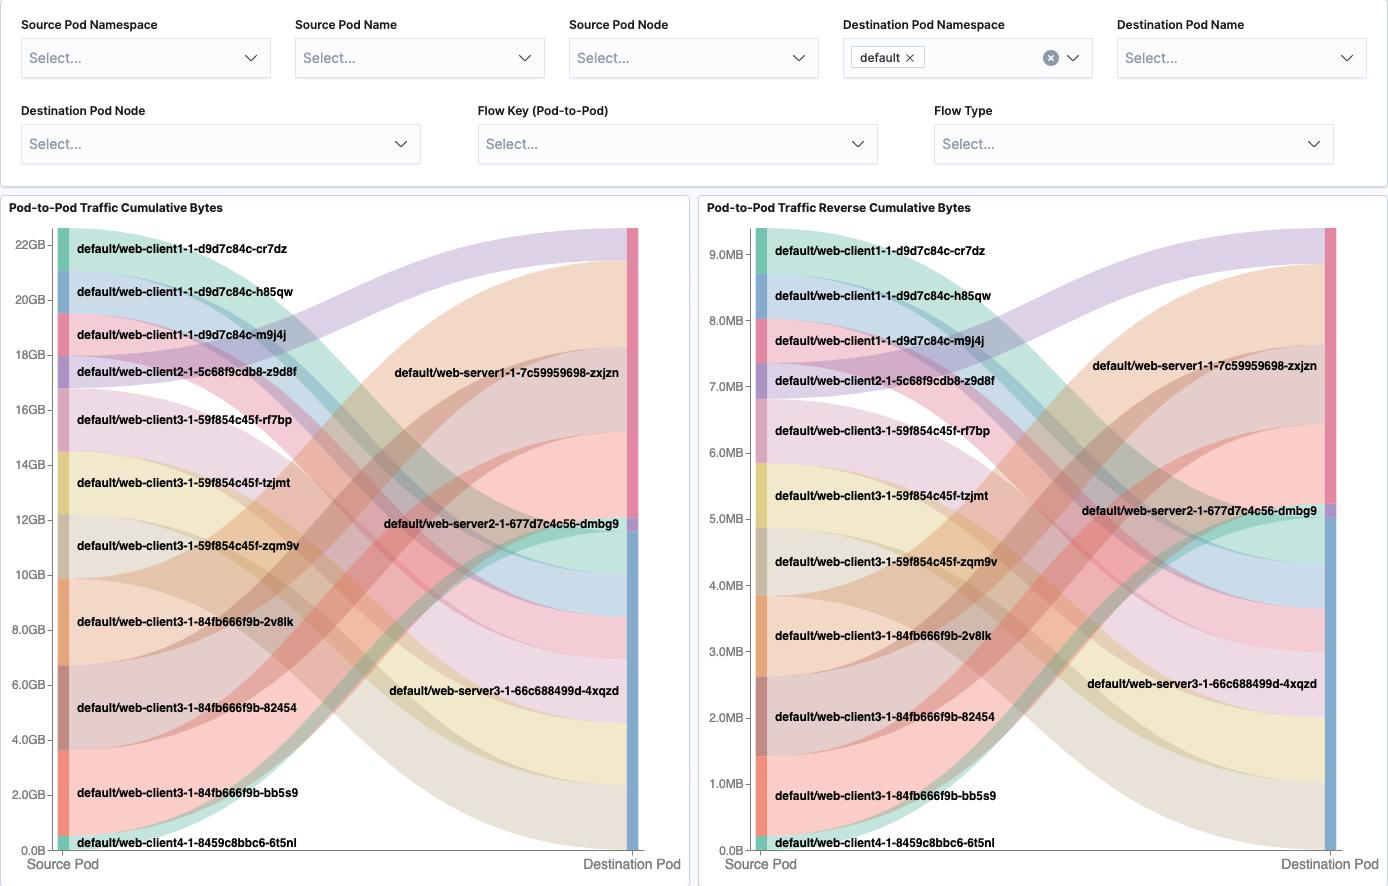 Flow Visualization Pod-to-Pod Dashboard